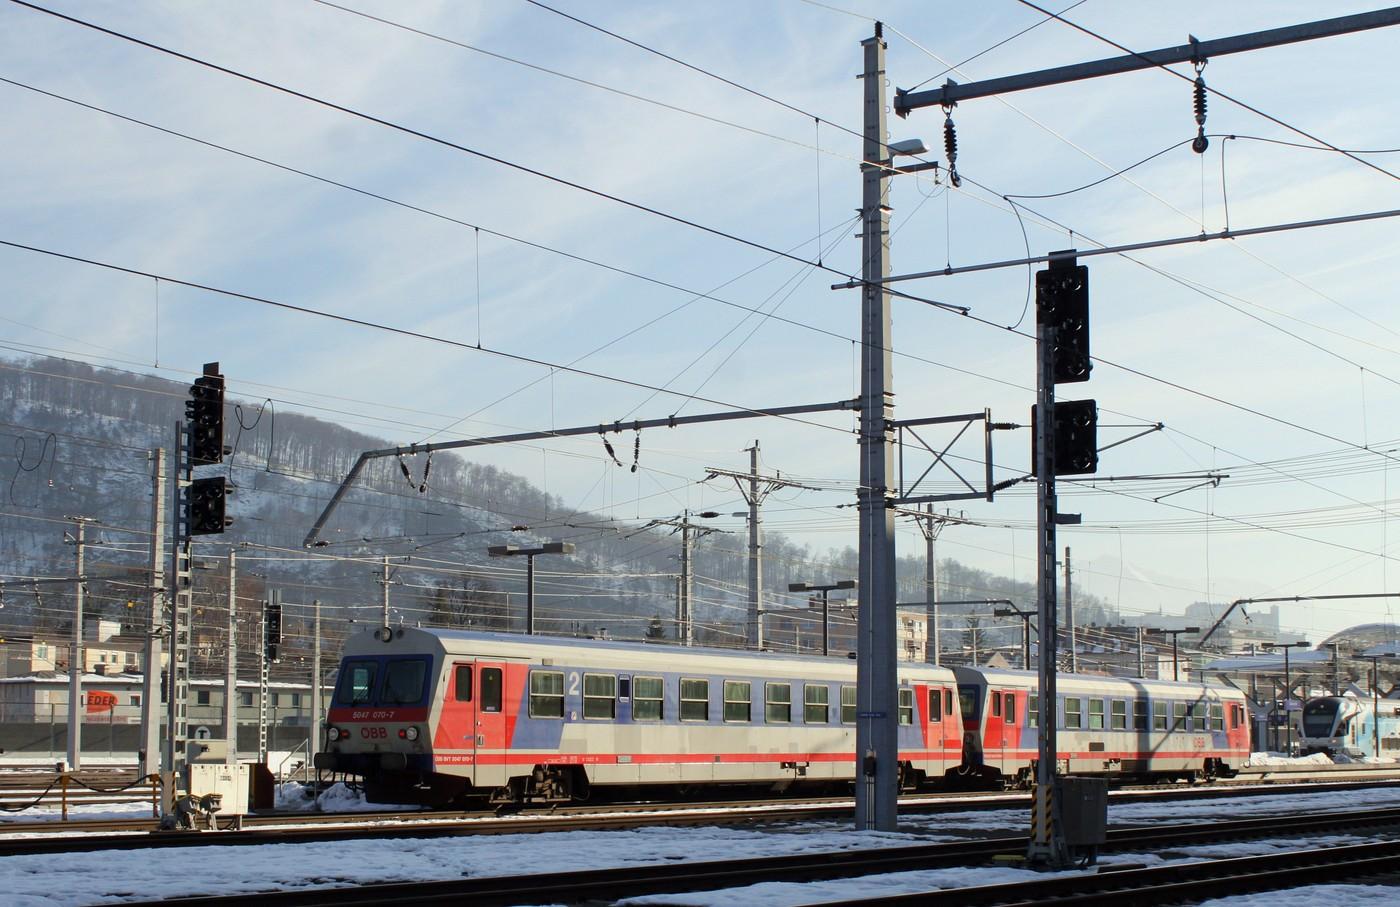 http://www.eisenbahn-im-bild.de/Temp/A_Salzburg_IMG_5830.jpg